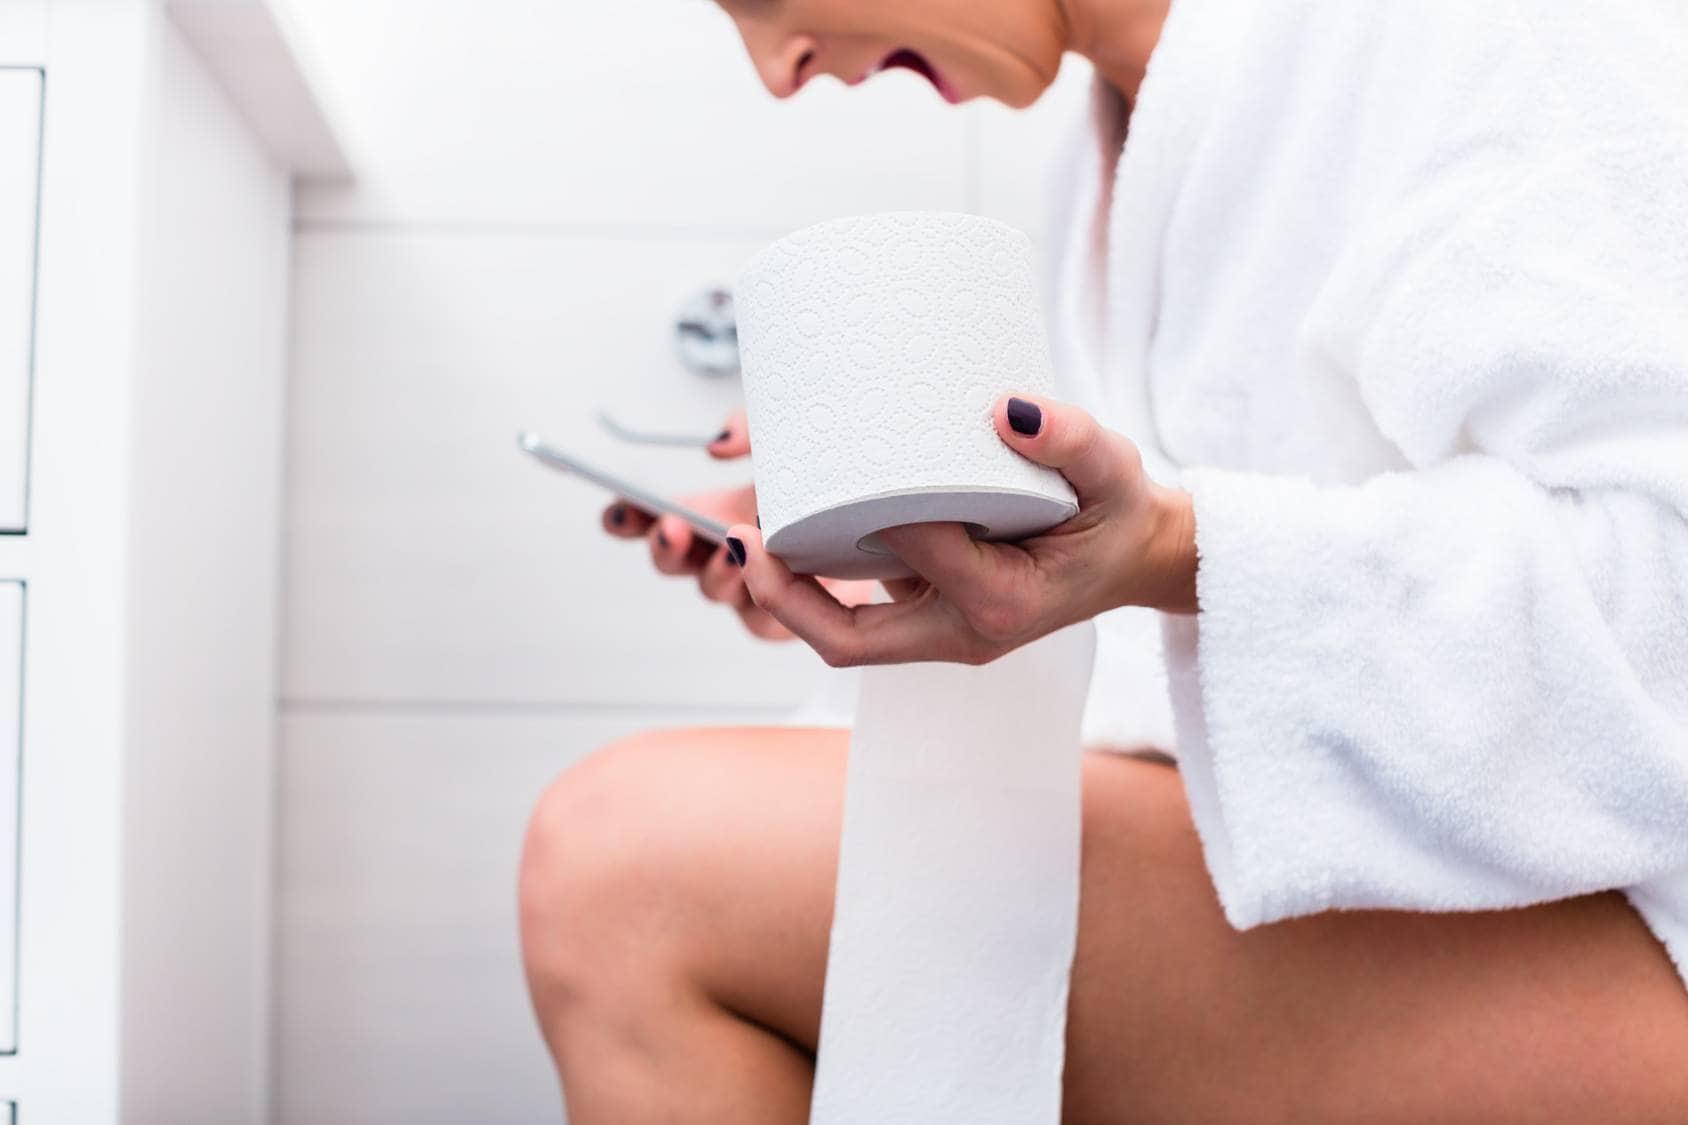 urinvägsinfektion mens